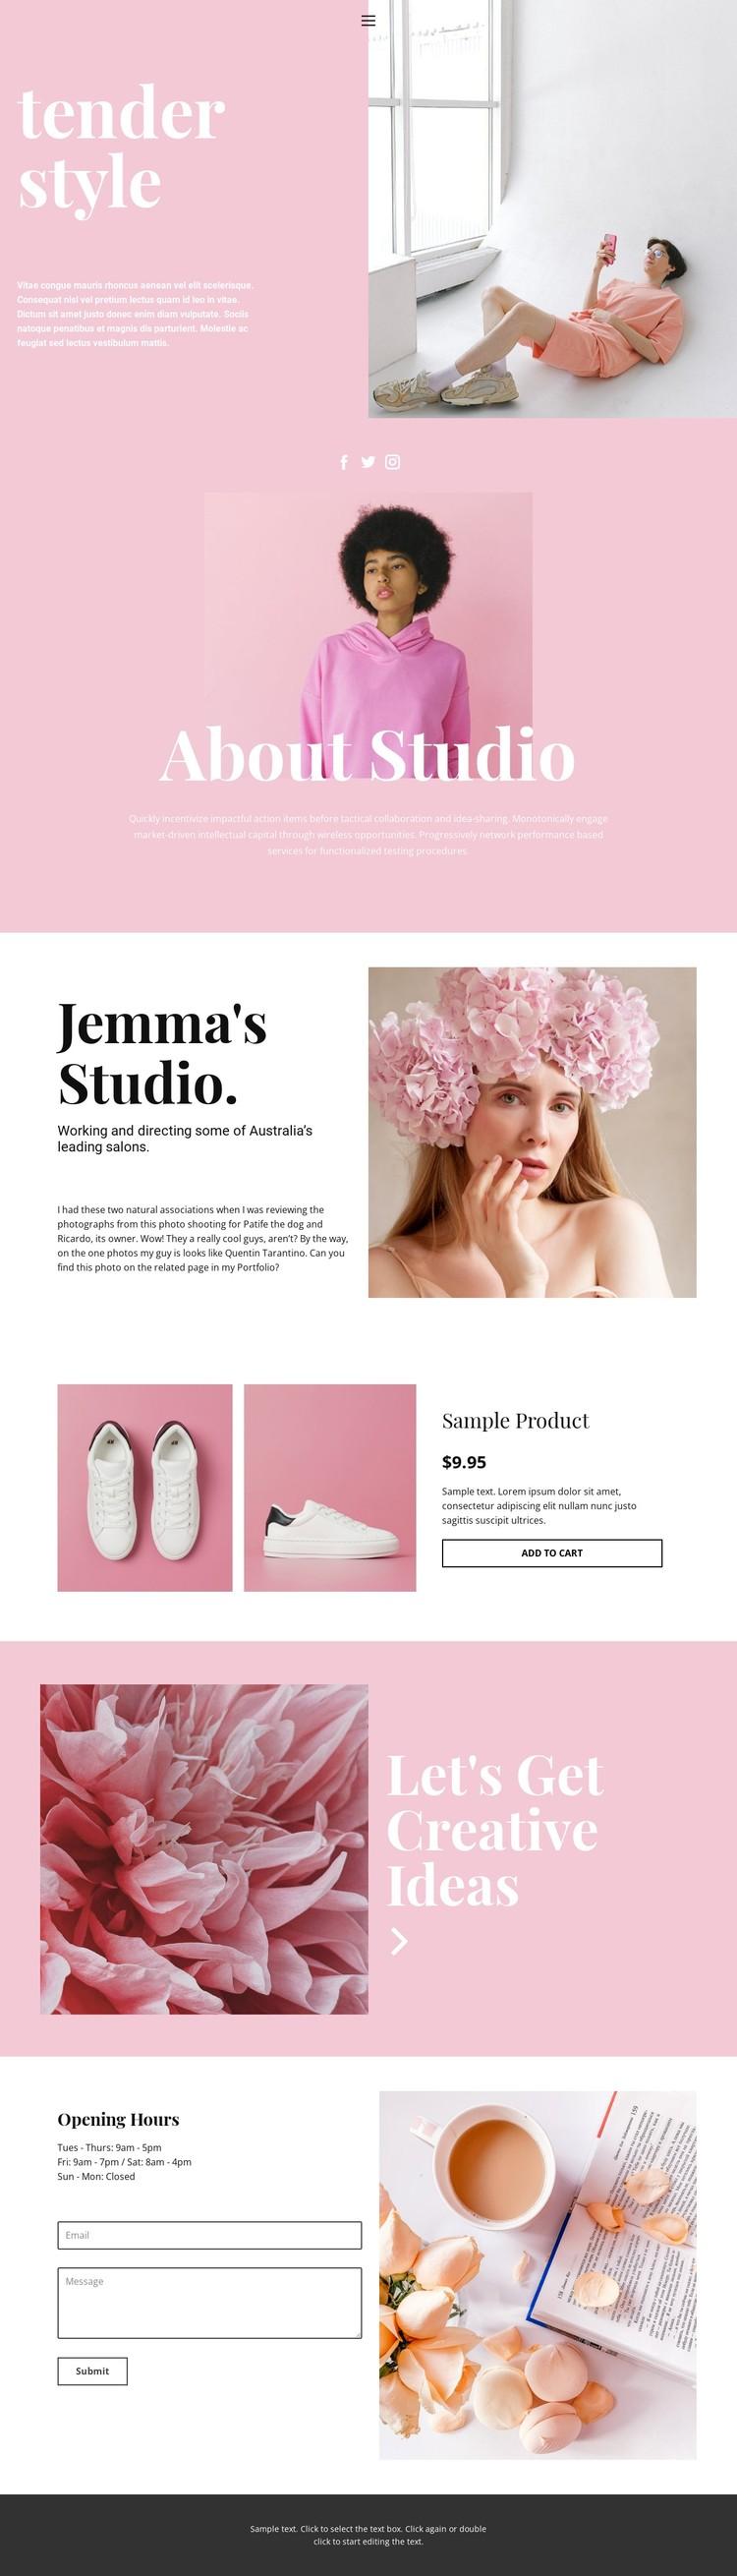 Fashion news Static Site Generator